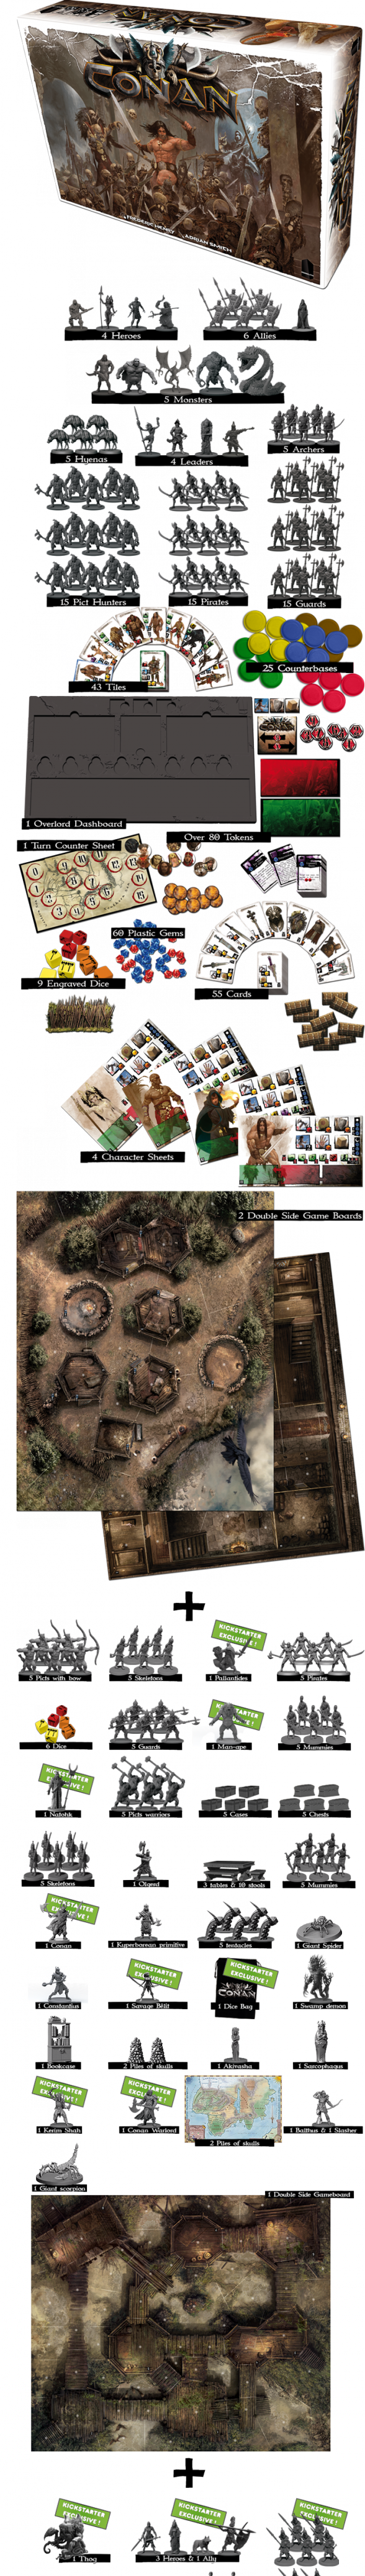 Conan - Monolith Games